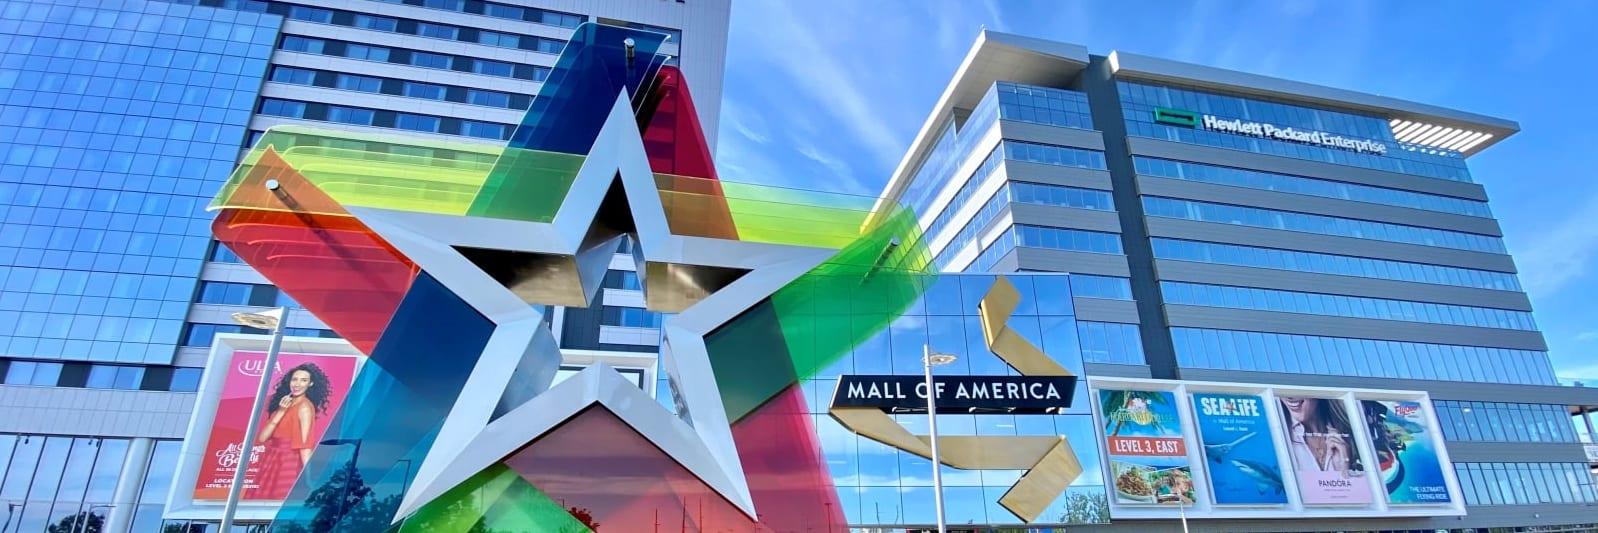 Mall-of-America-w1600-w1598.jpg